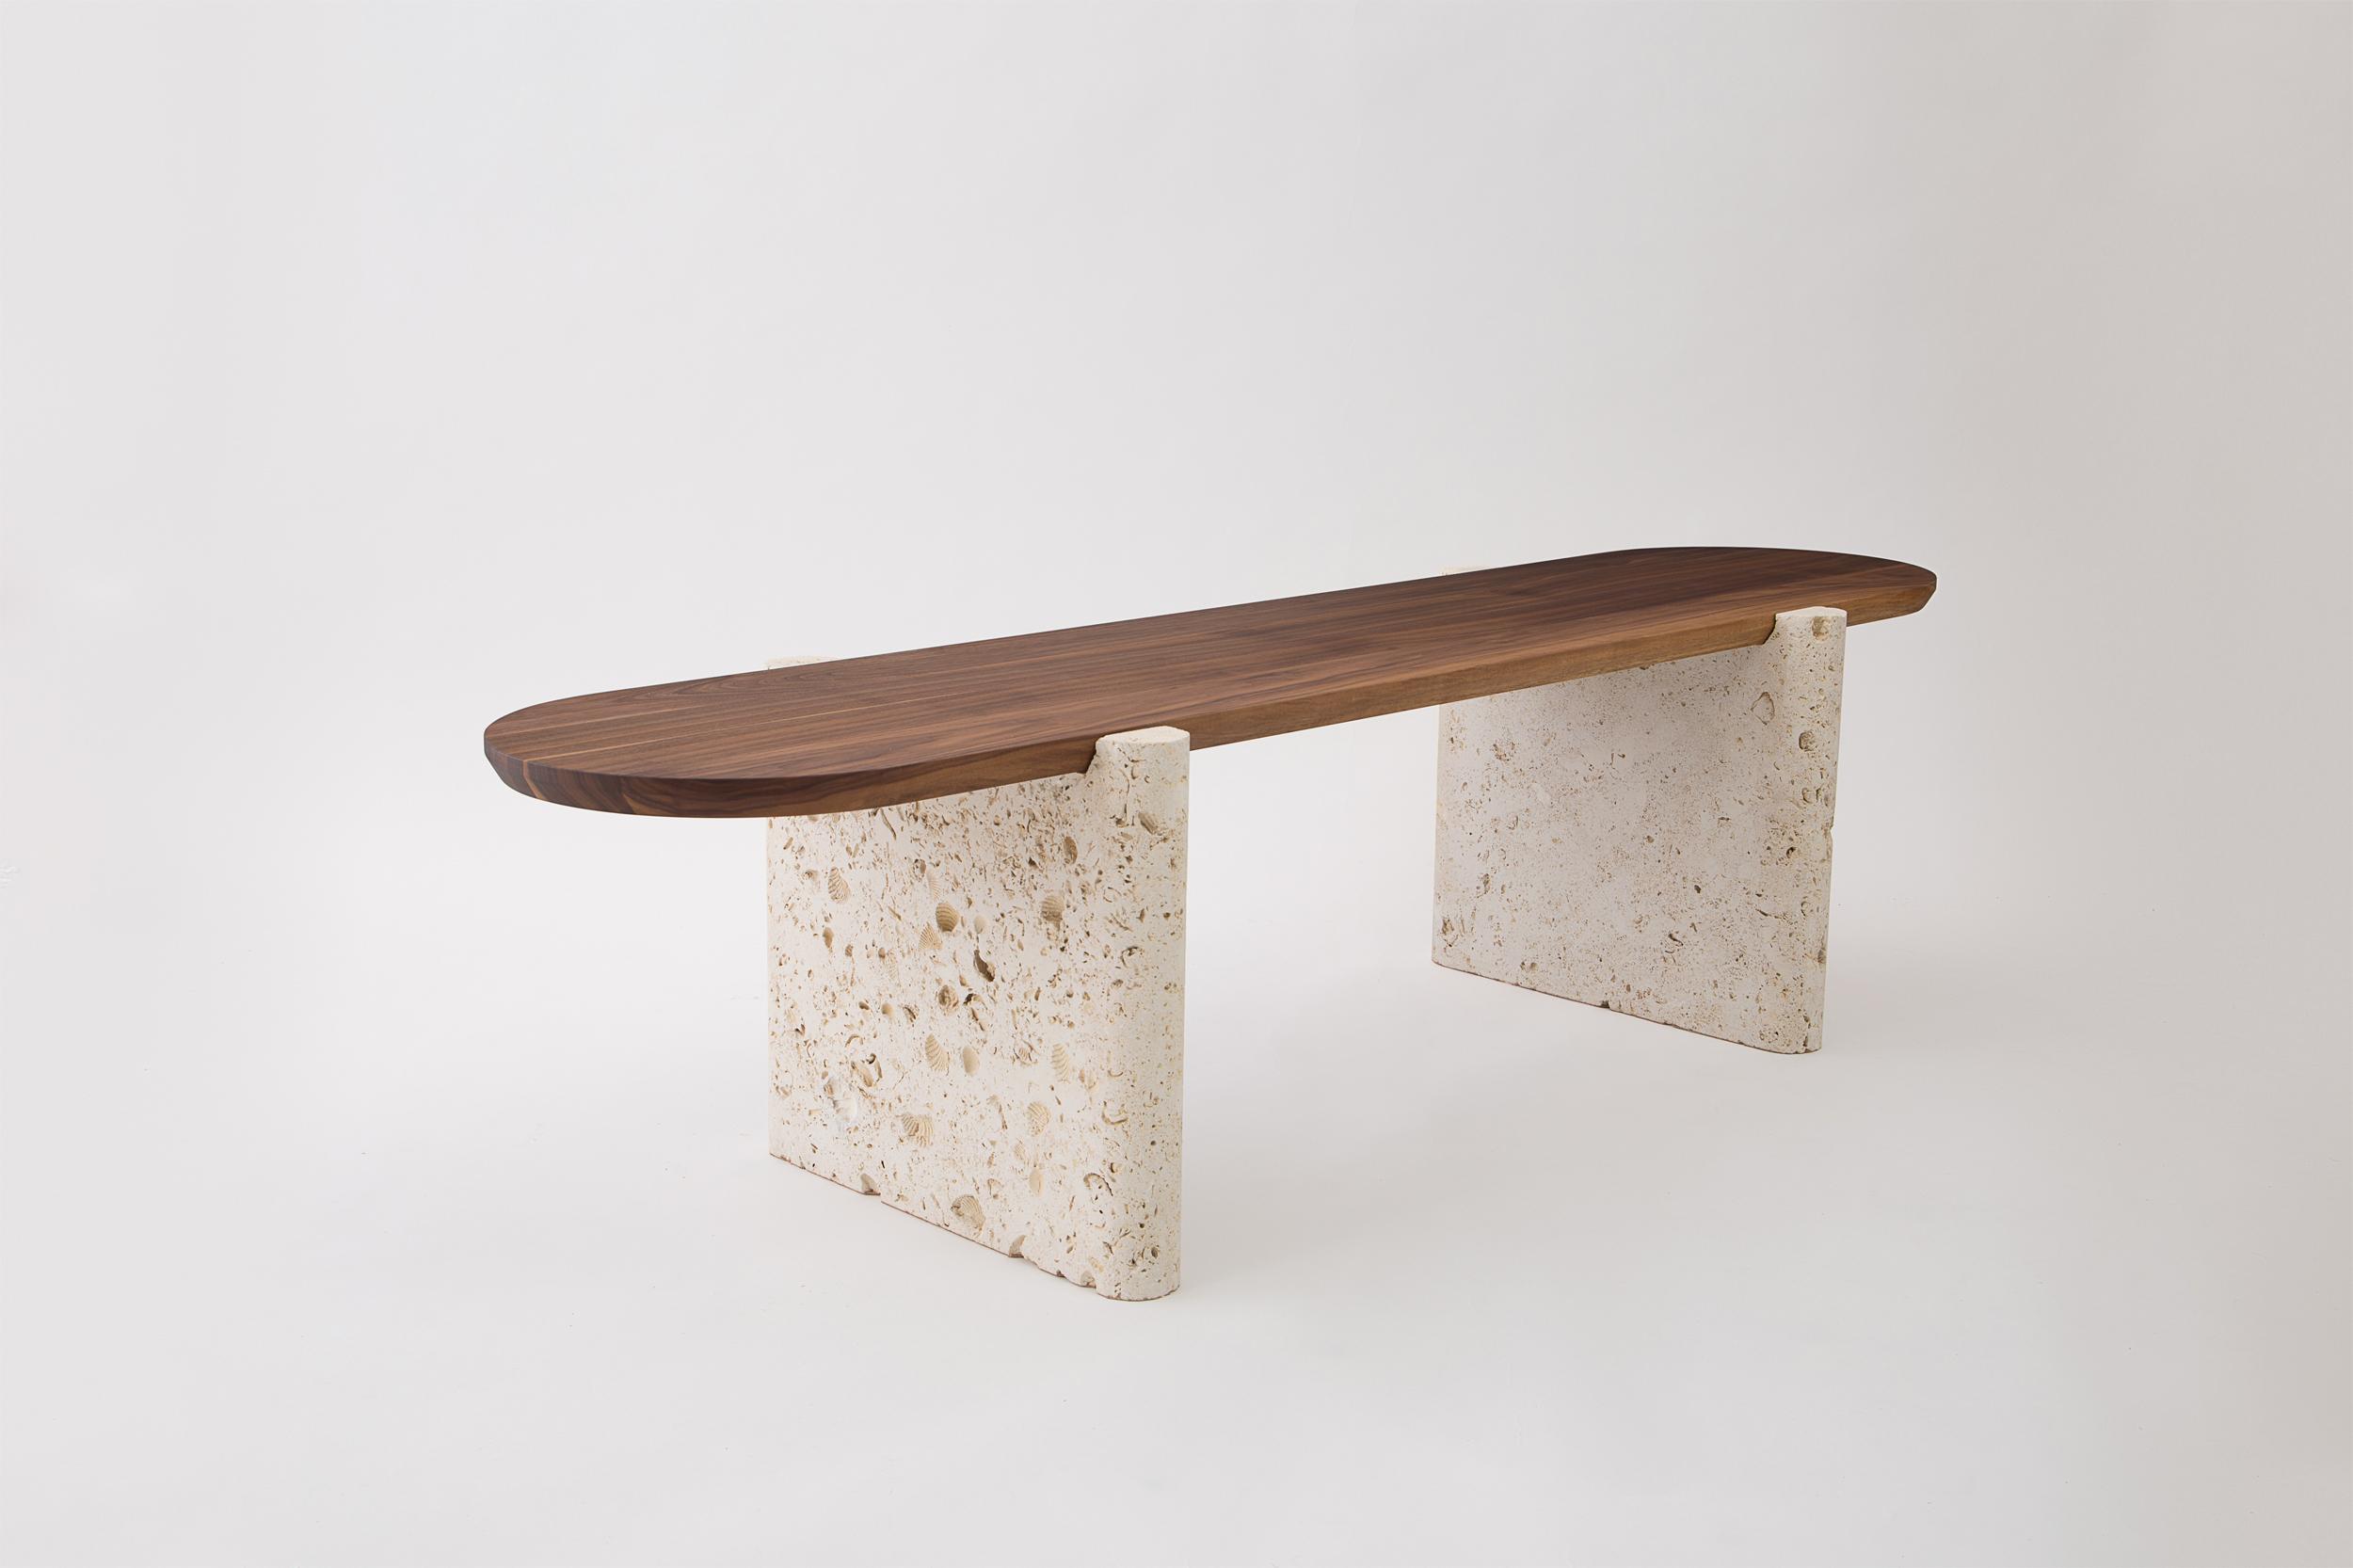 YUCCASTUFF_LAVACA TABLE_VIEW 005.jpg